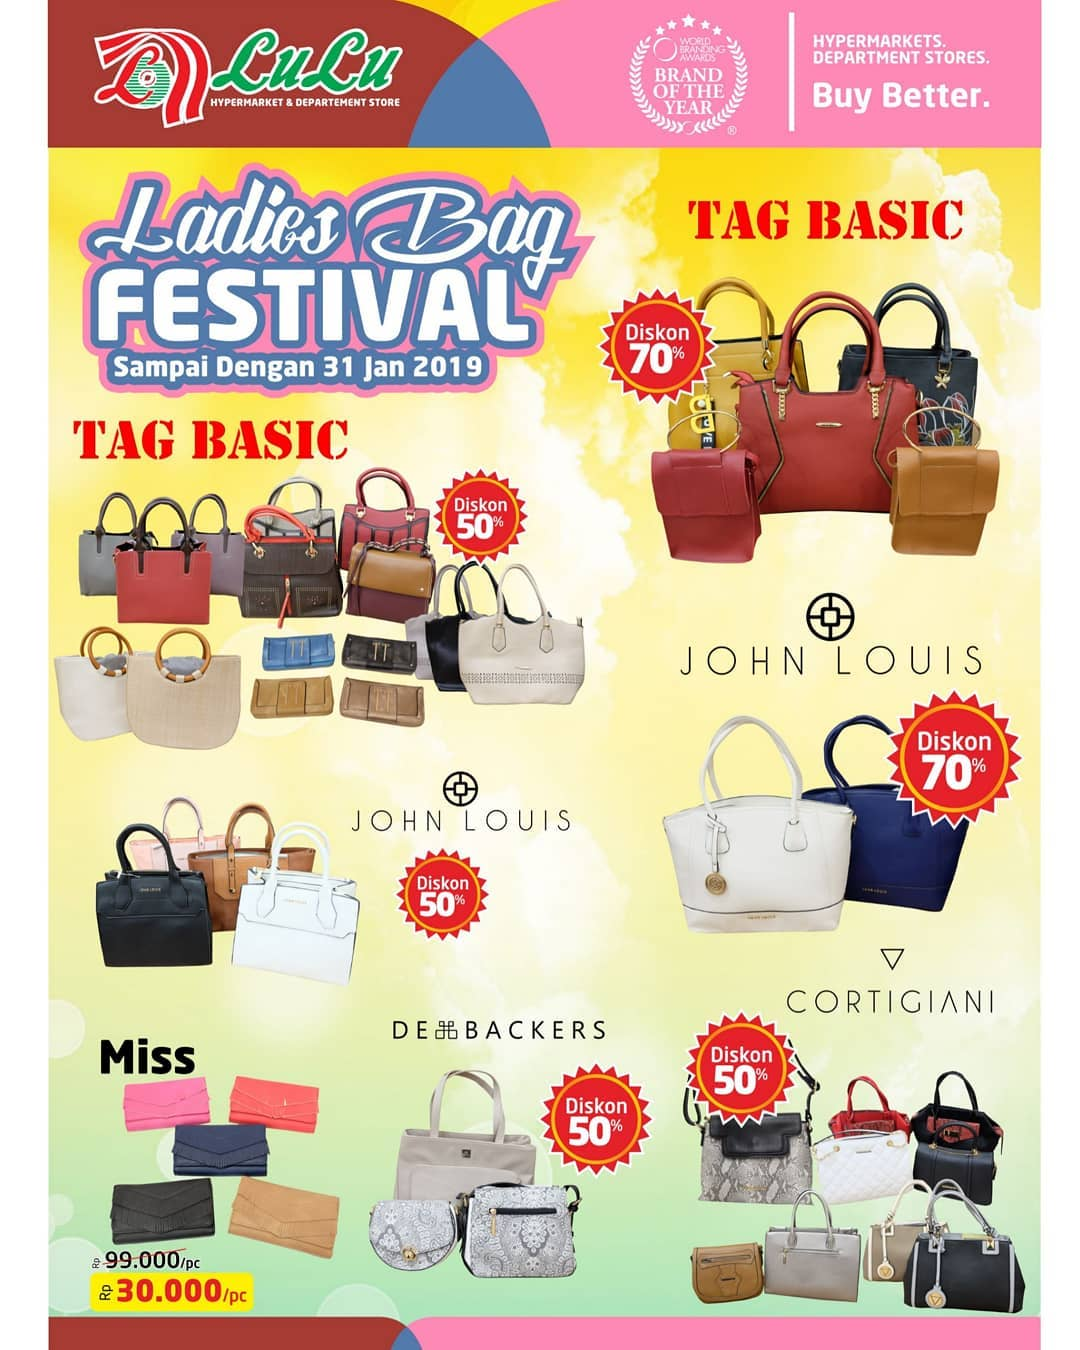 #LuluStore - Promo Ladies Bag Festival Diskon s.d 70% (s.d 31 Jan 2019)